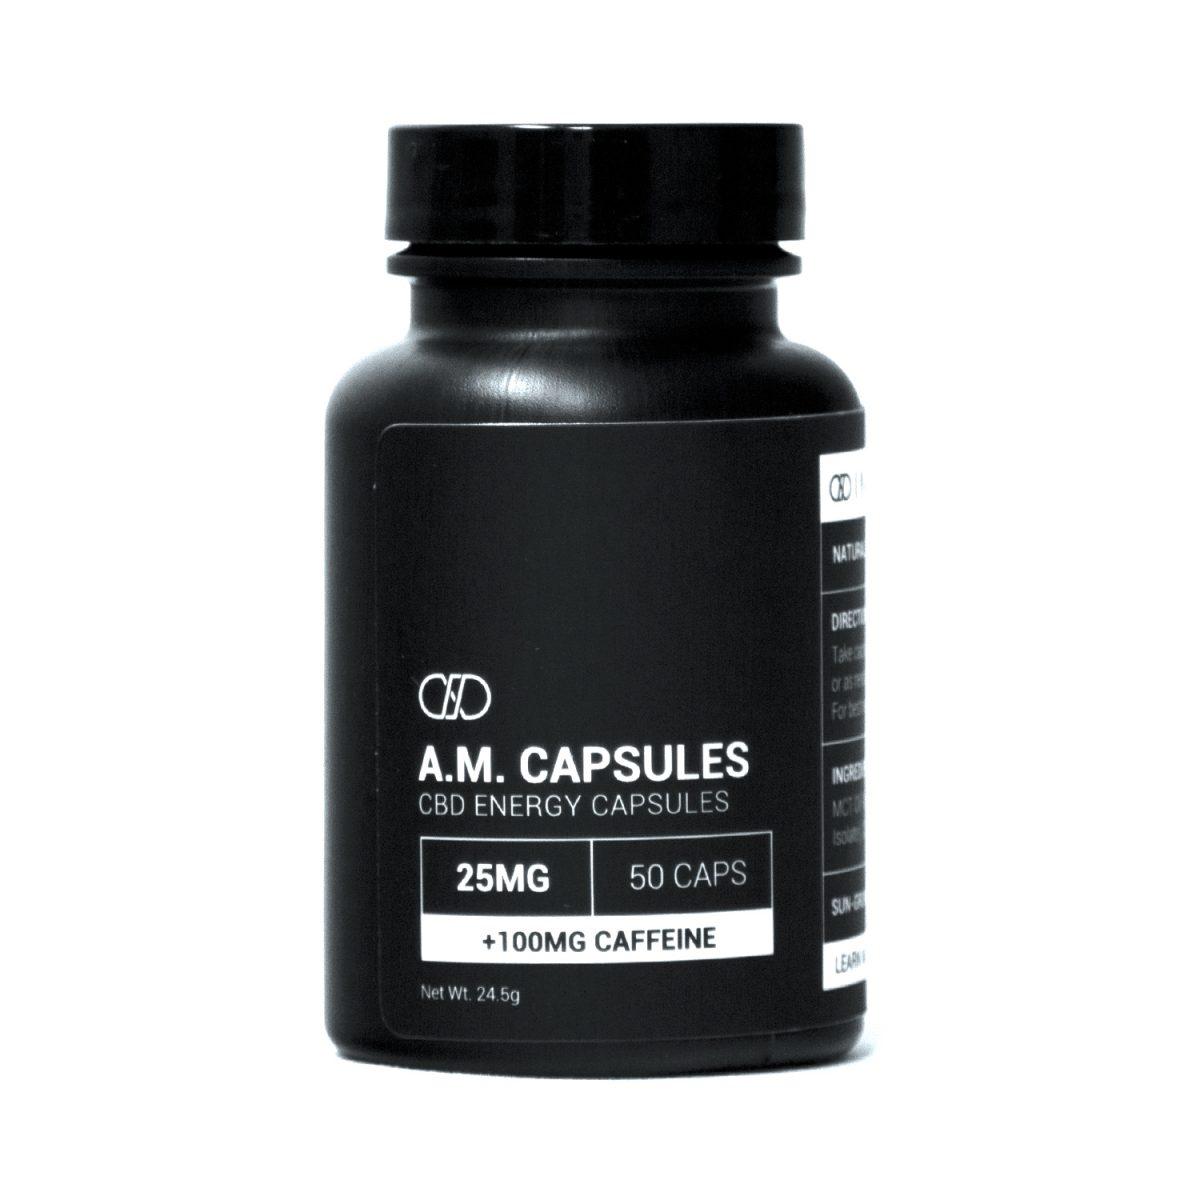 Wholesale A.M. Capsules